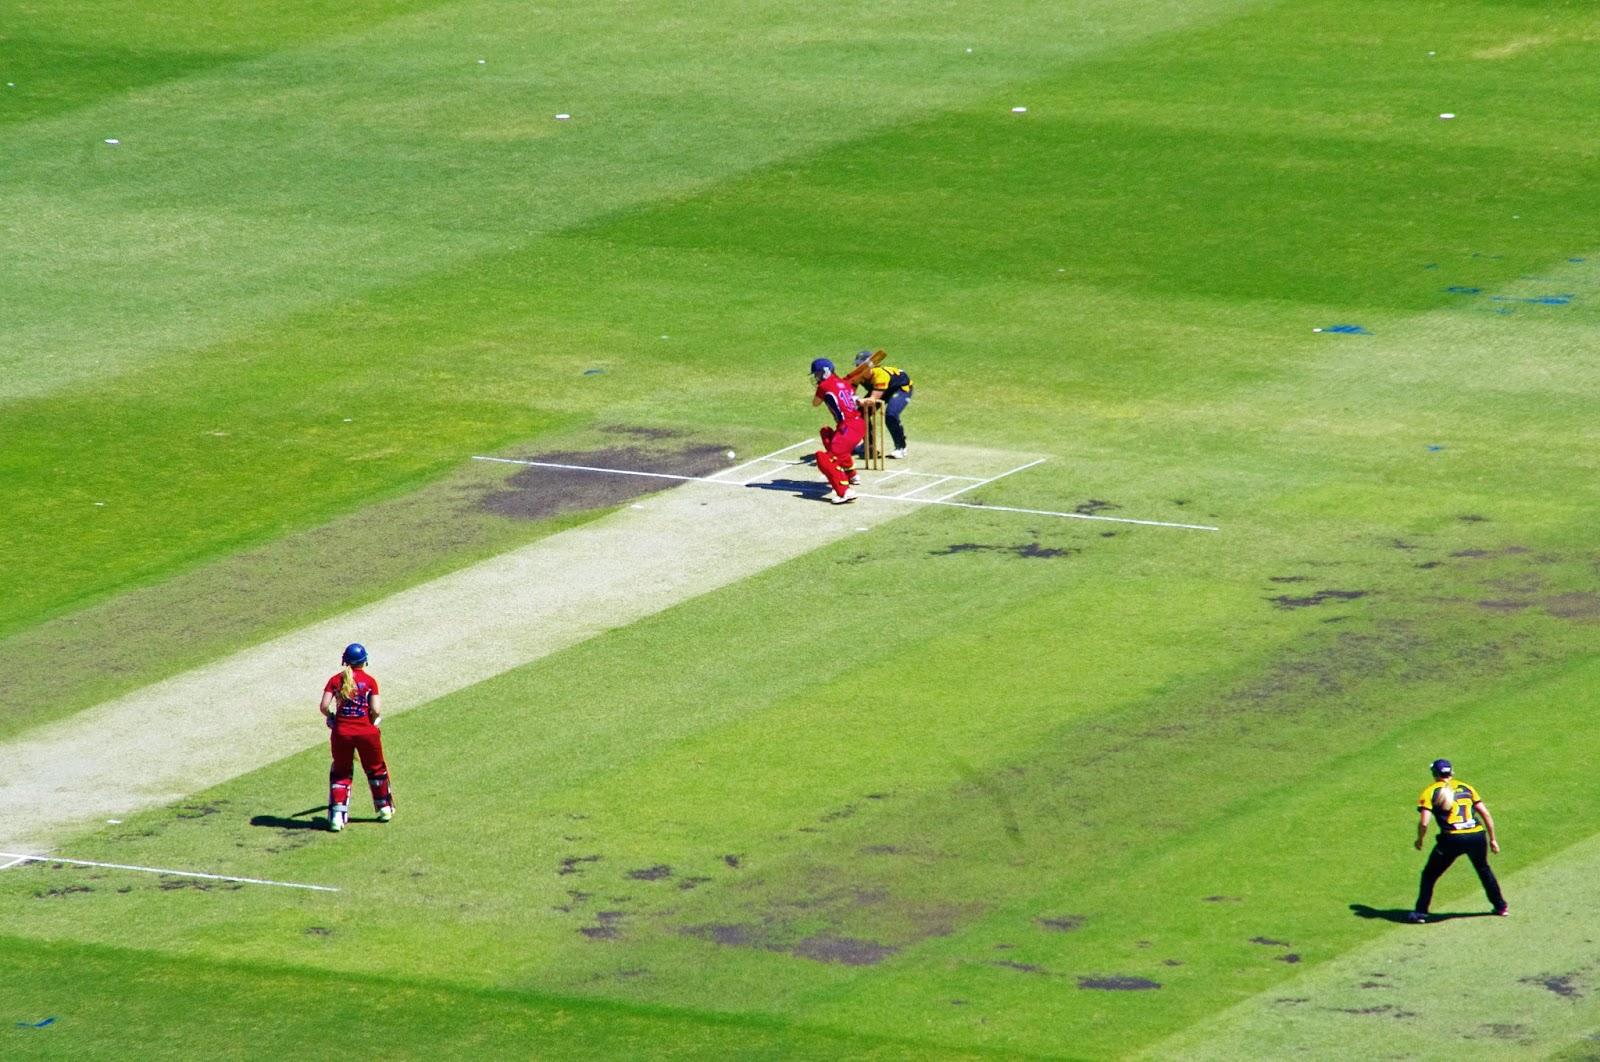 Melbourne Parkview Hotel Cricket Views